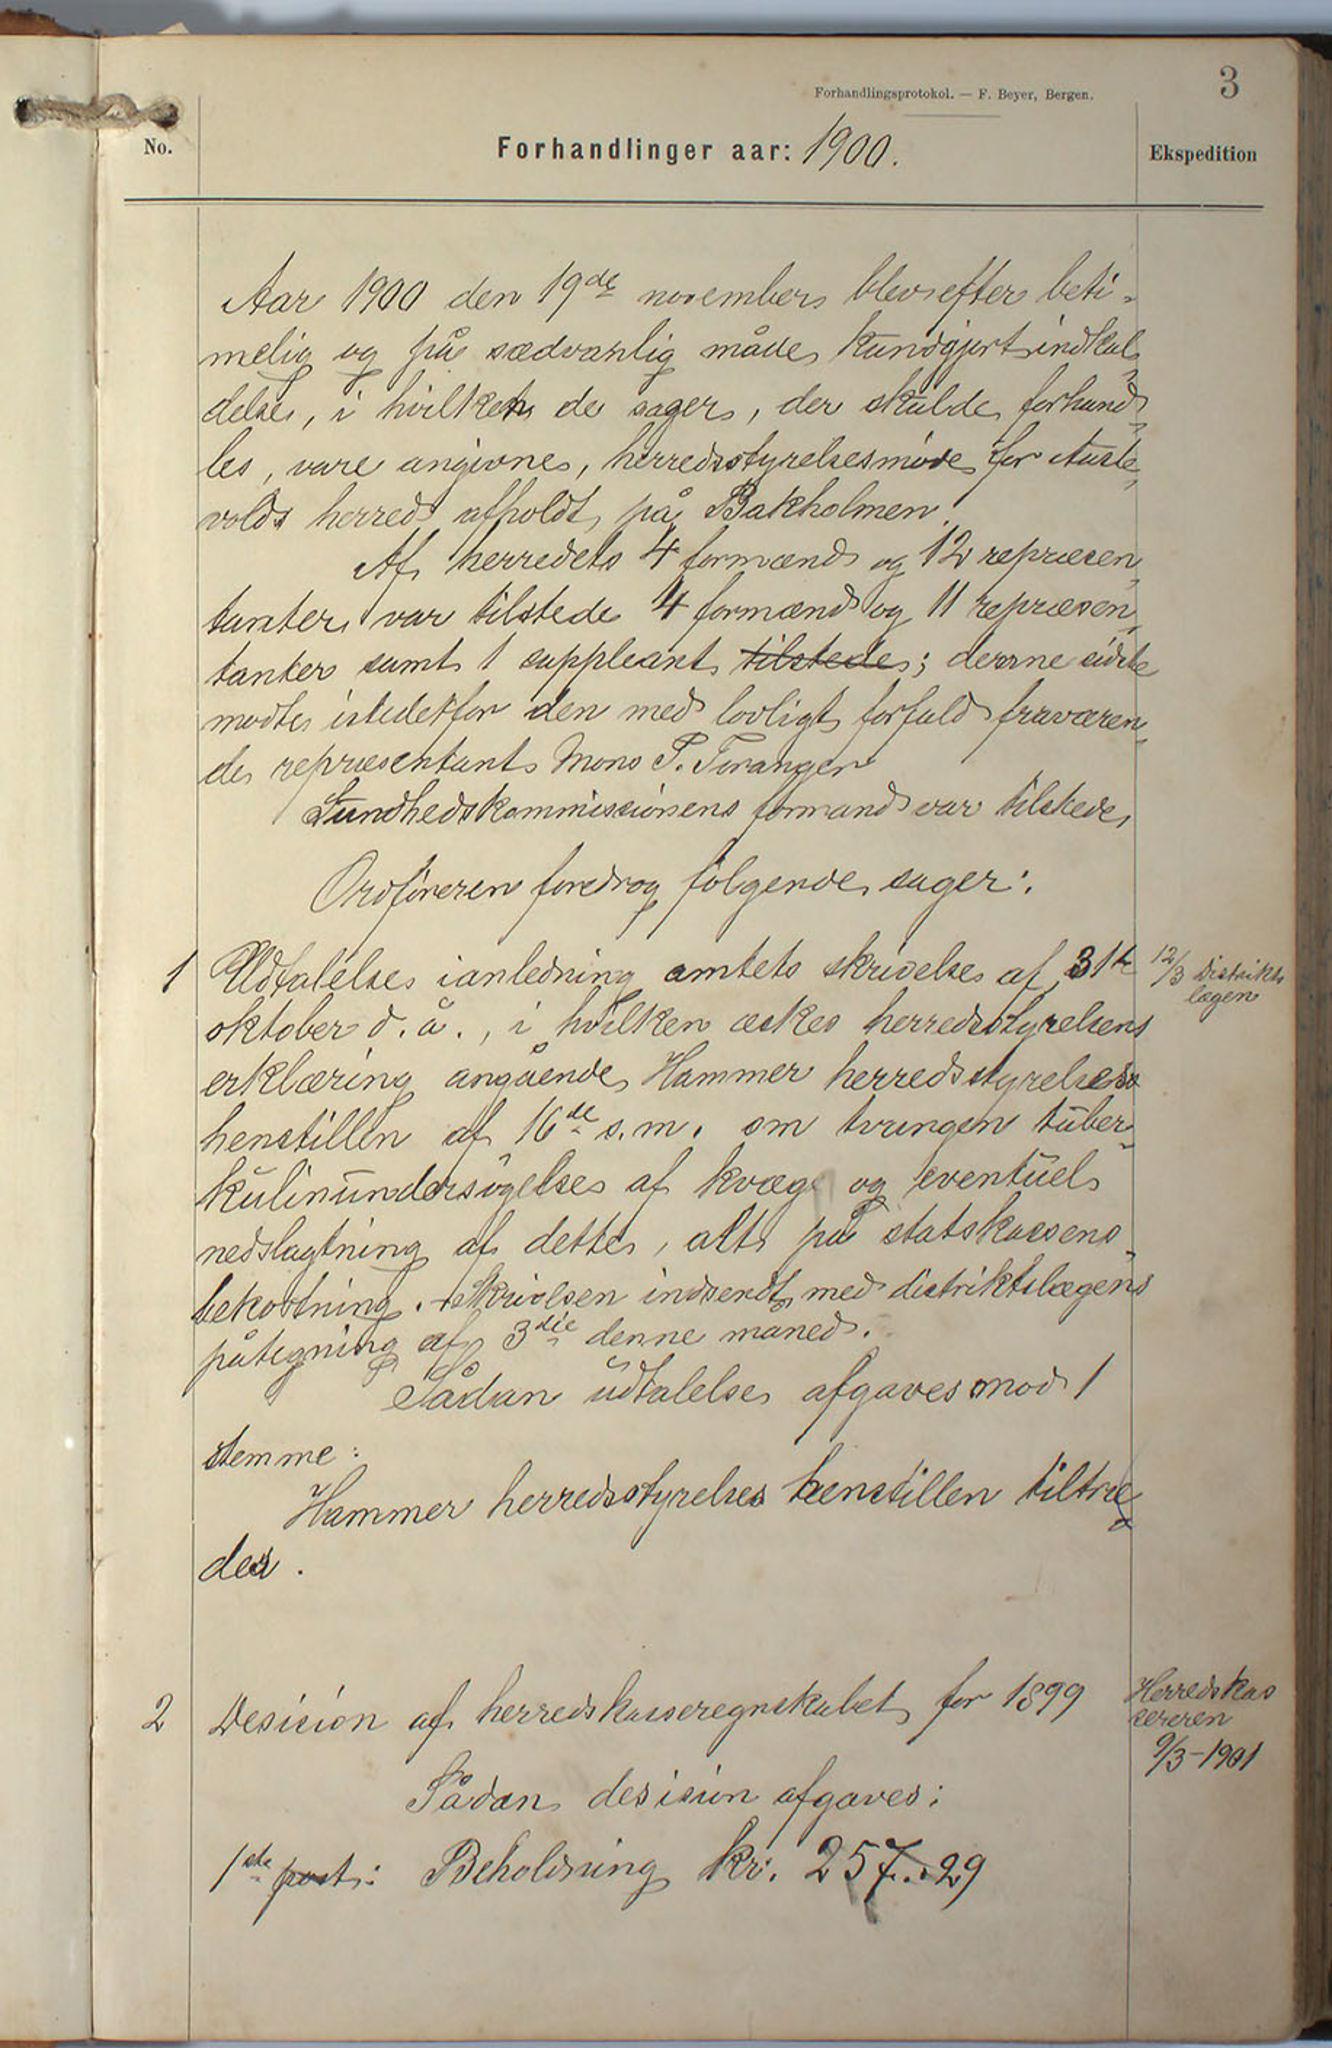 IKAH, Austevoll kommune. Formannskapet, A/Aa/L0002a: Møtebok Austevoll heradstyre, 1901-1910, s. 4